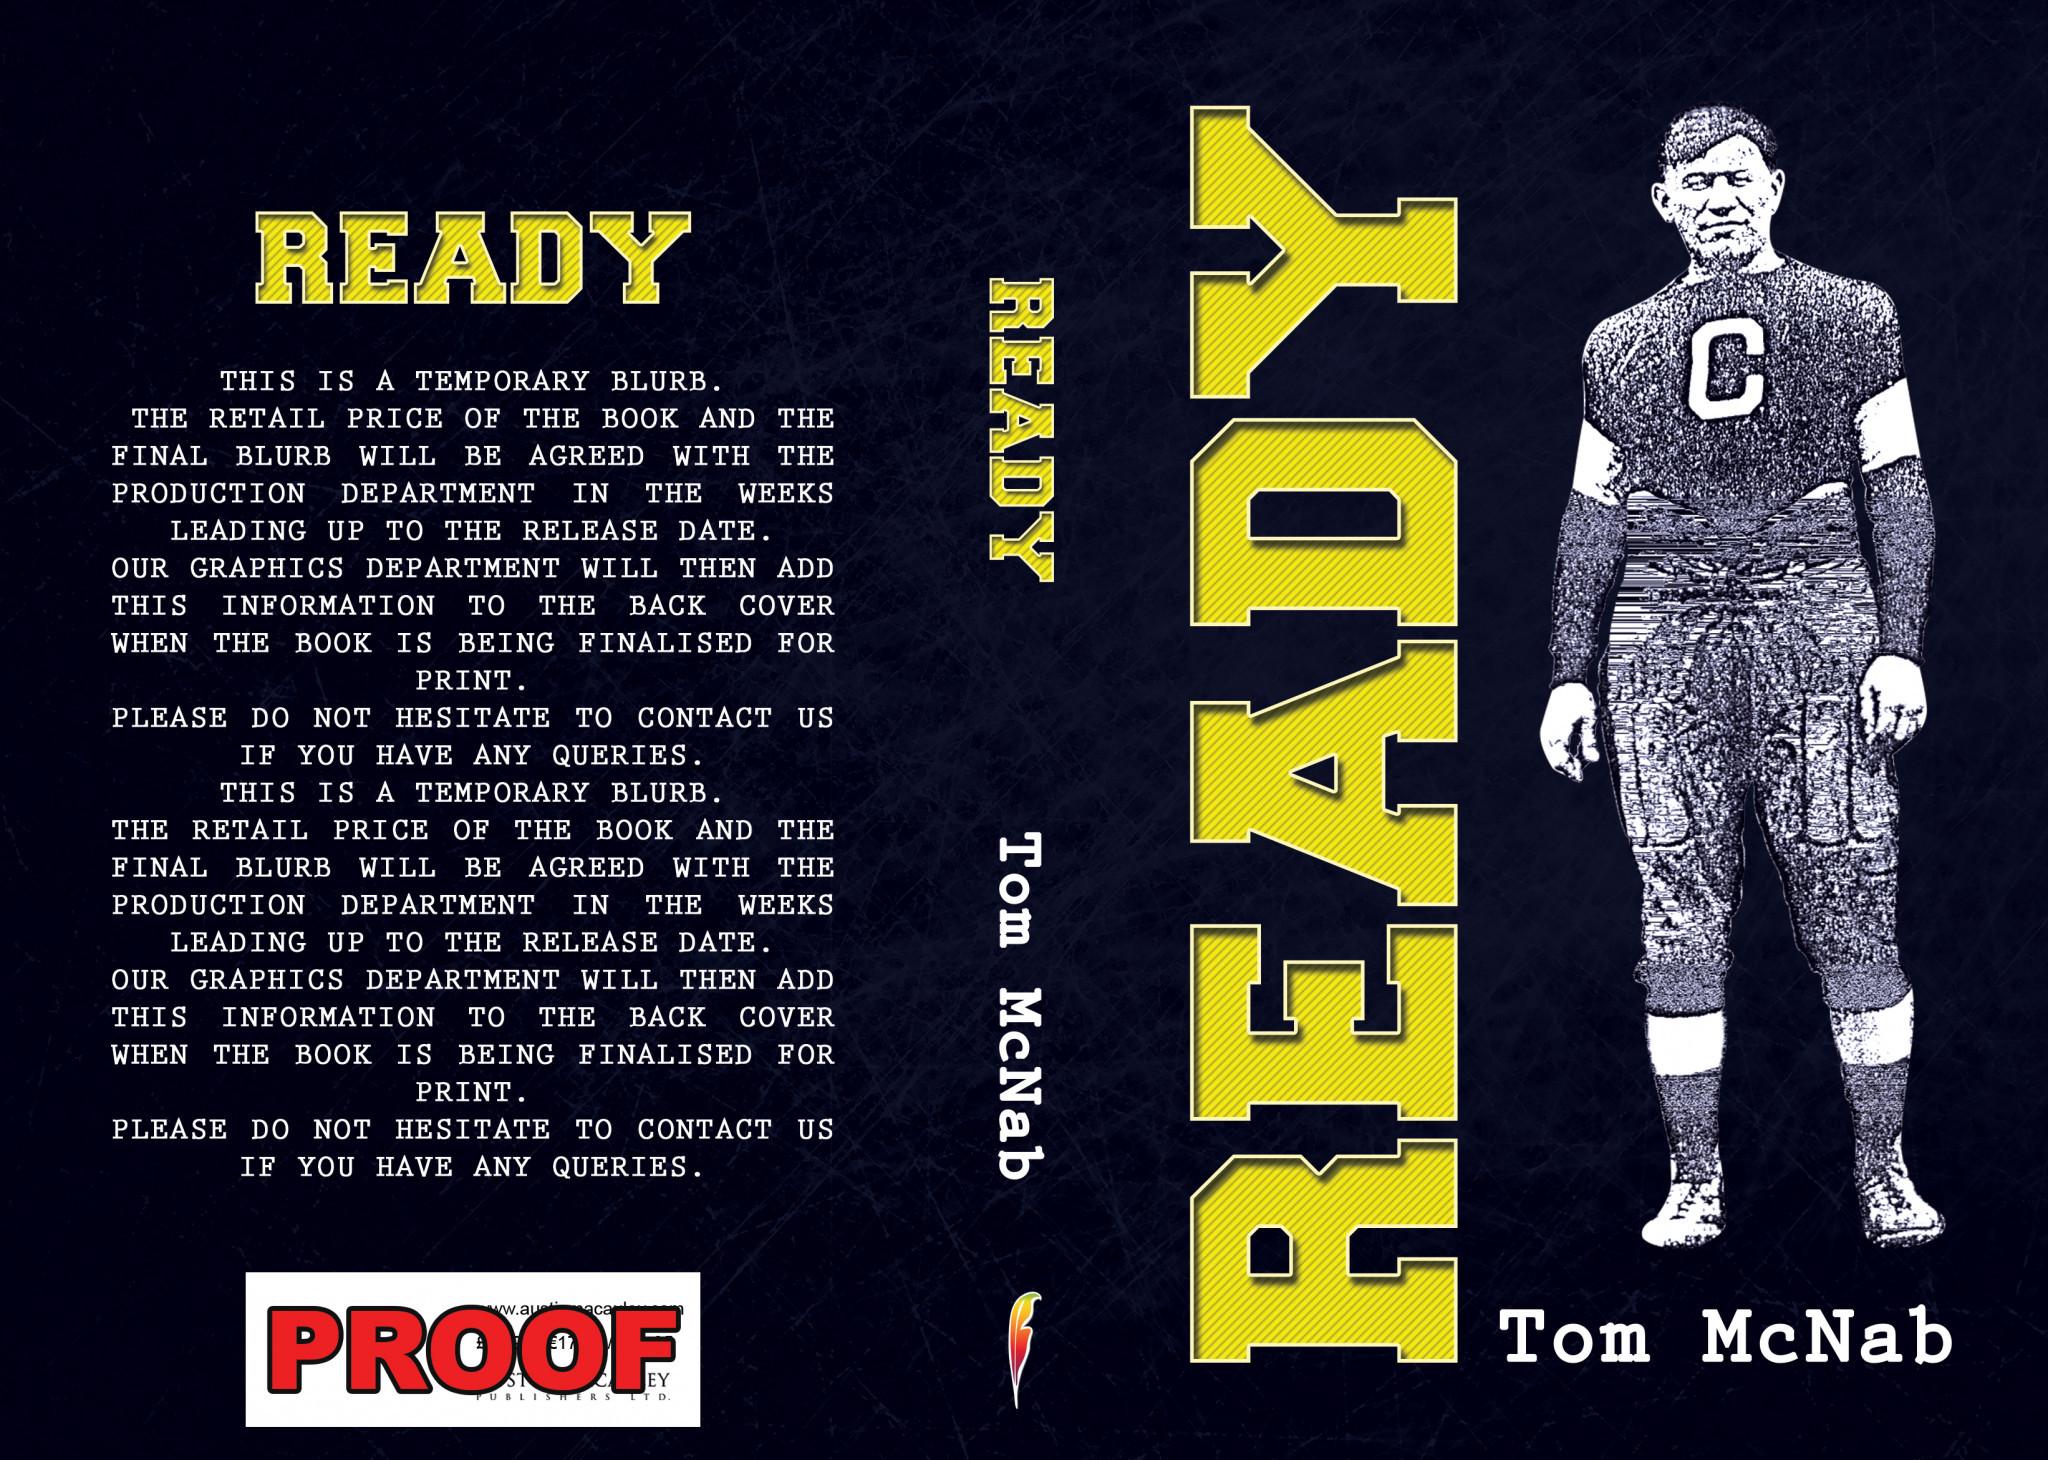 Jim Thorpe inspired a Tom McNab novel ©Tom McNab